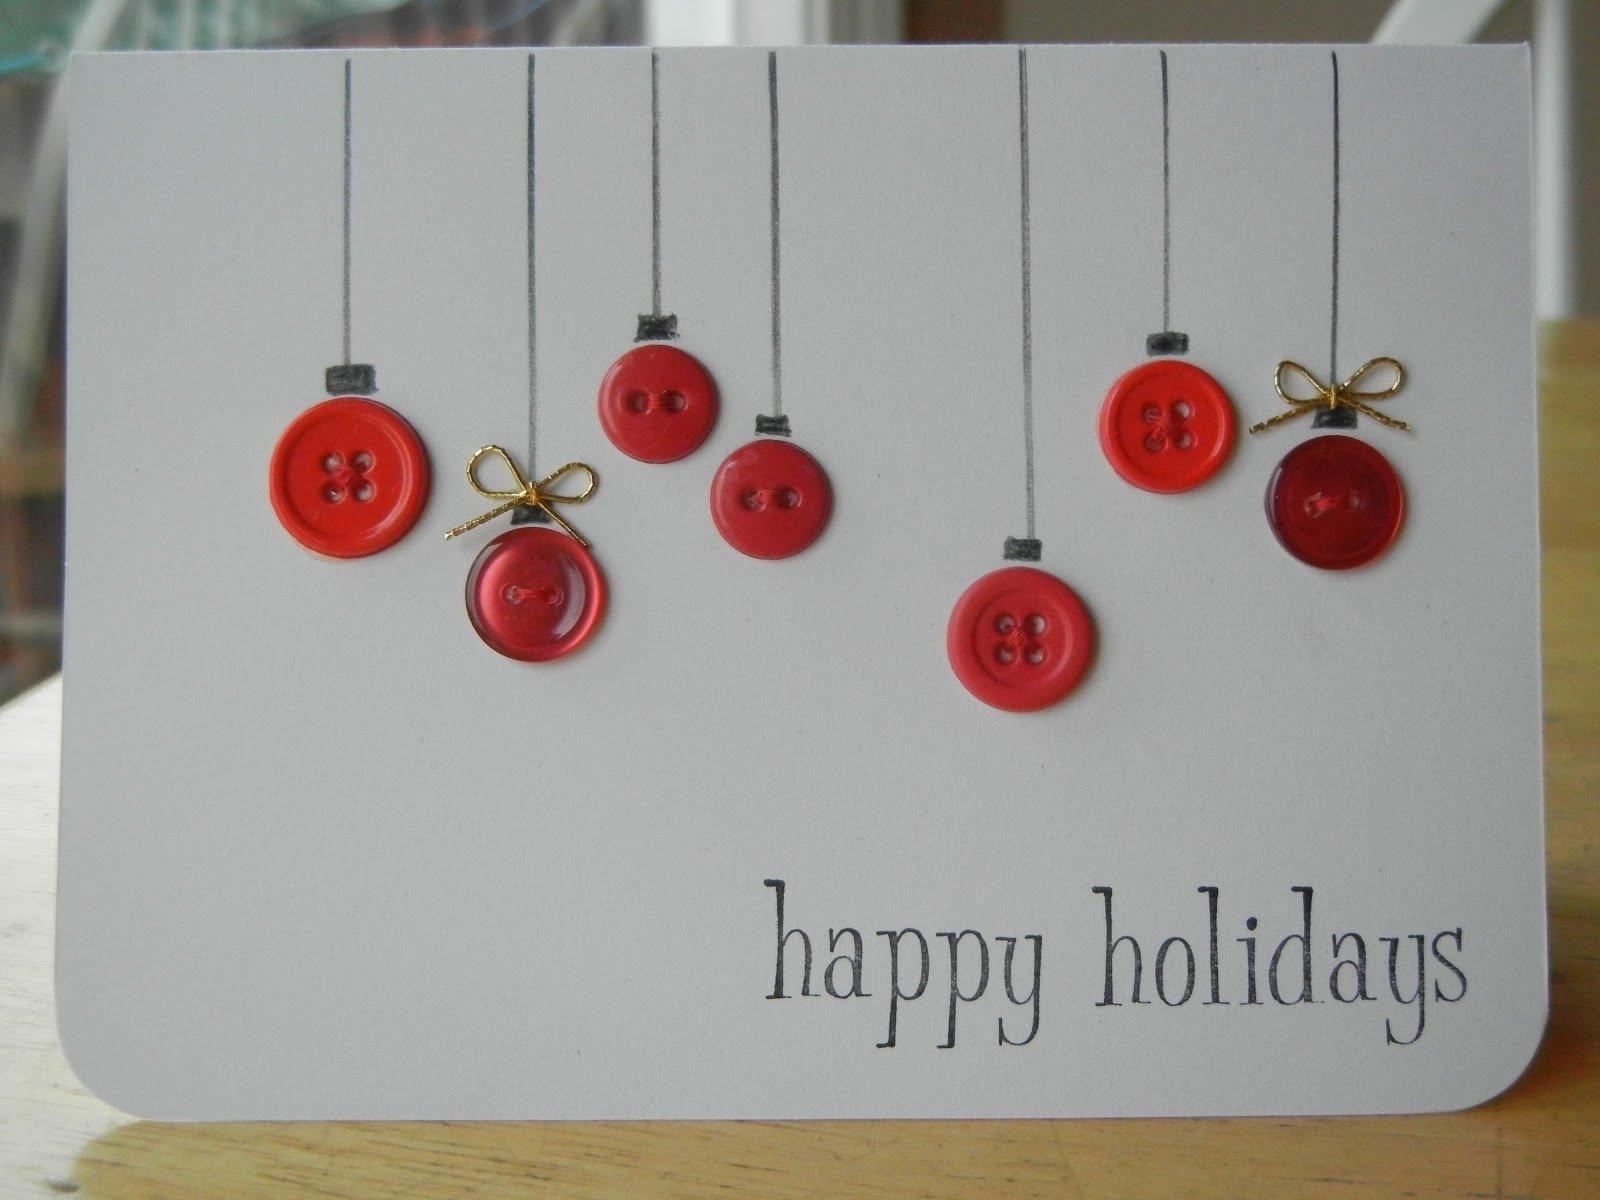 10 Trendy Christmas Card Ideas To Make